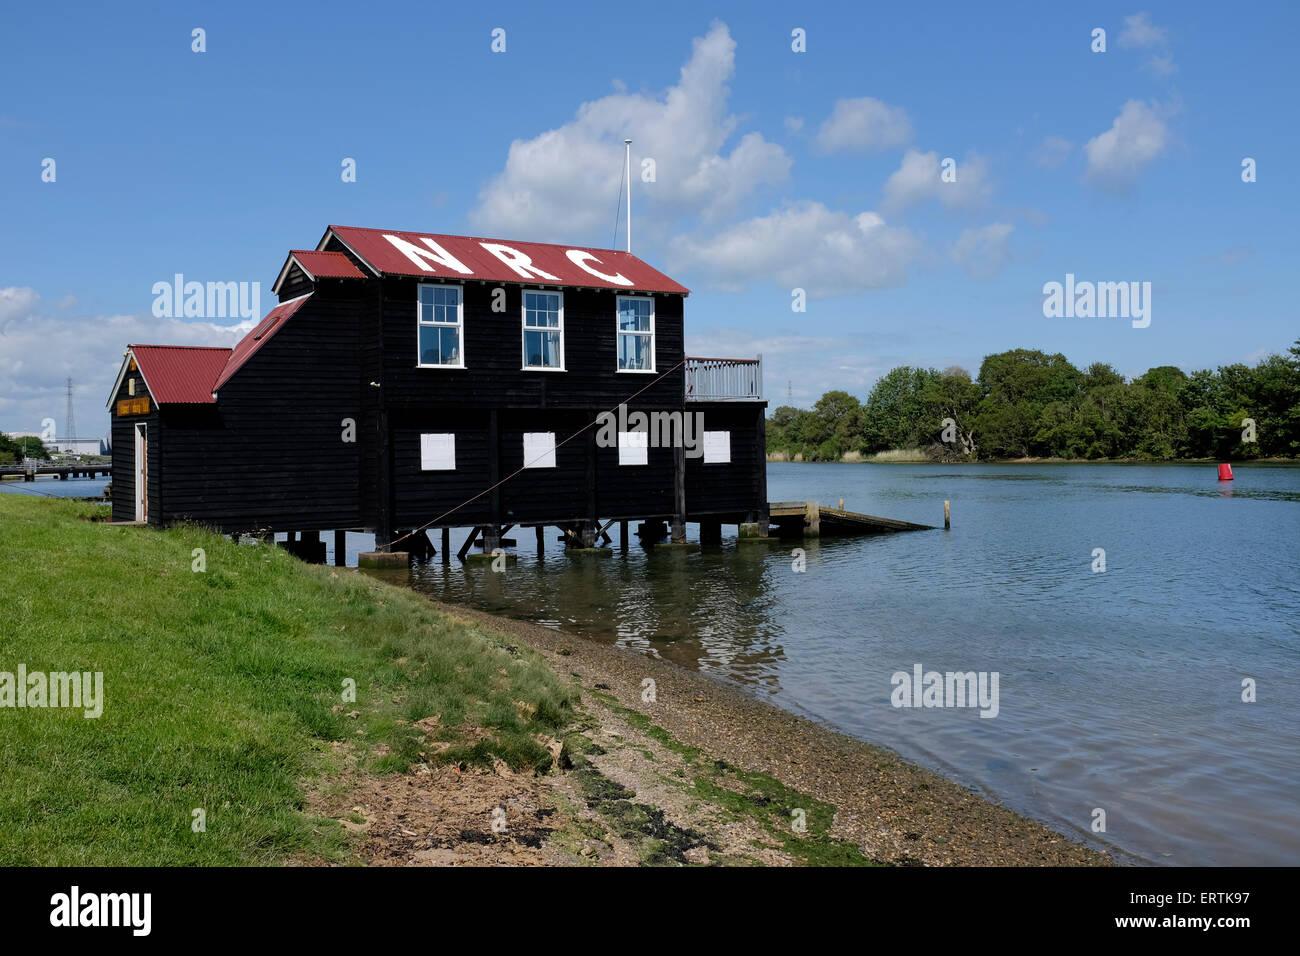 River Medina Newport Rowing Club Isle of Wight England UK - Stock Image